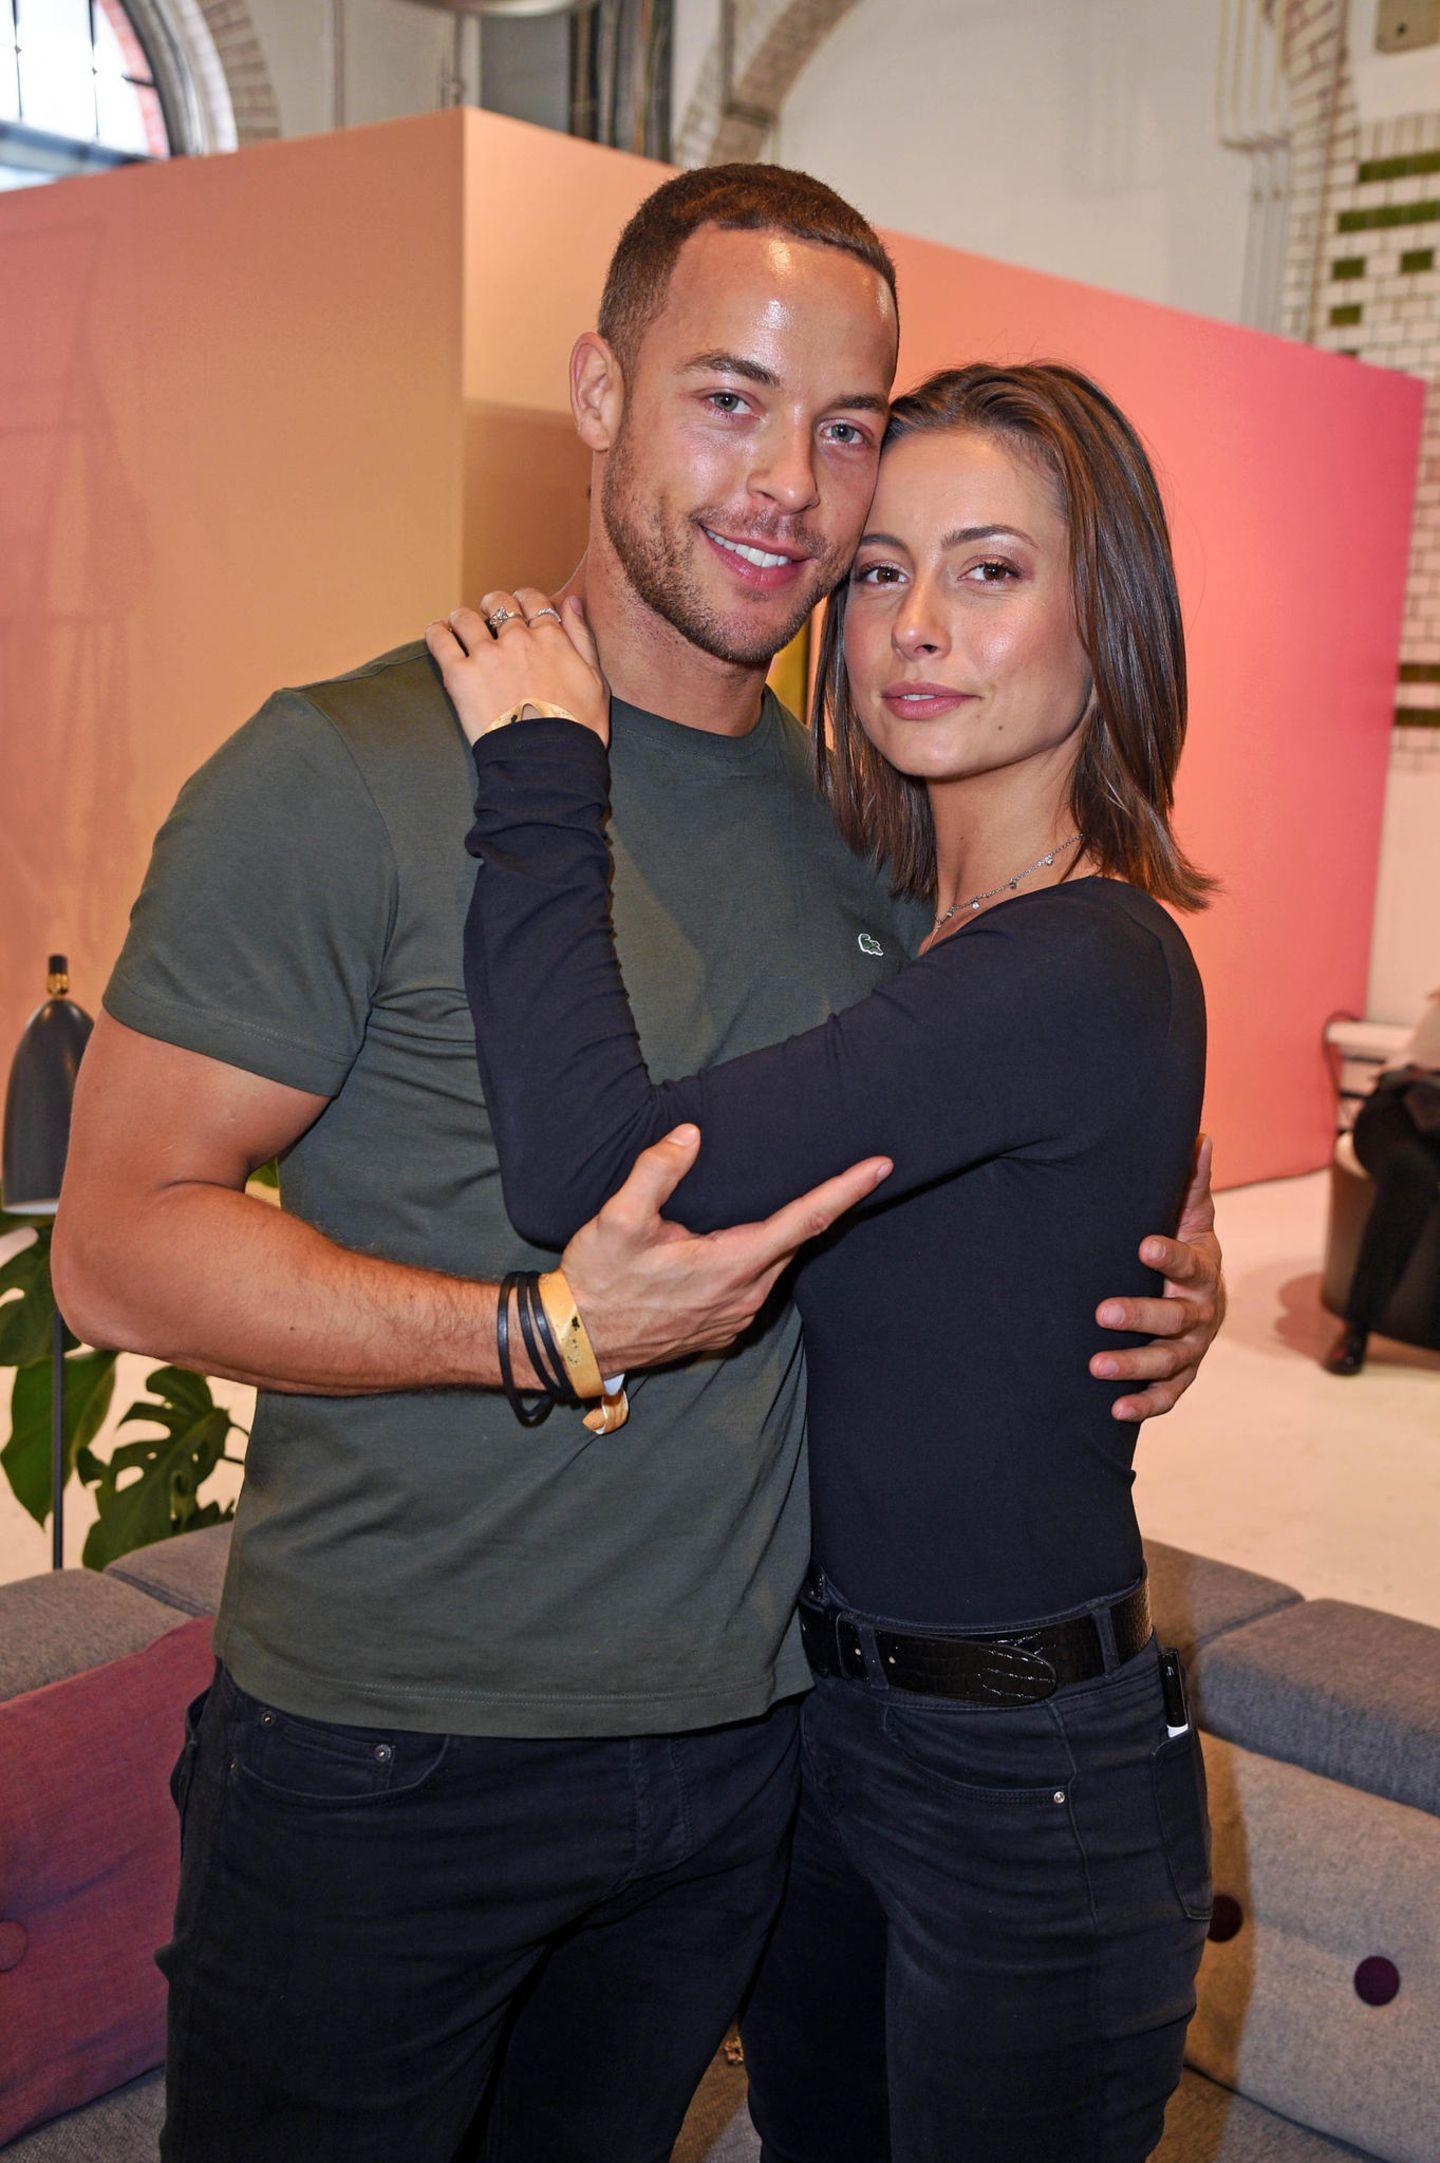 Promi-Trennungen 2020: Andrej Mangold und Jennifer Lange